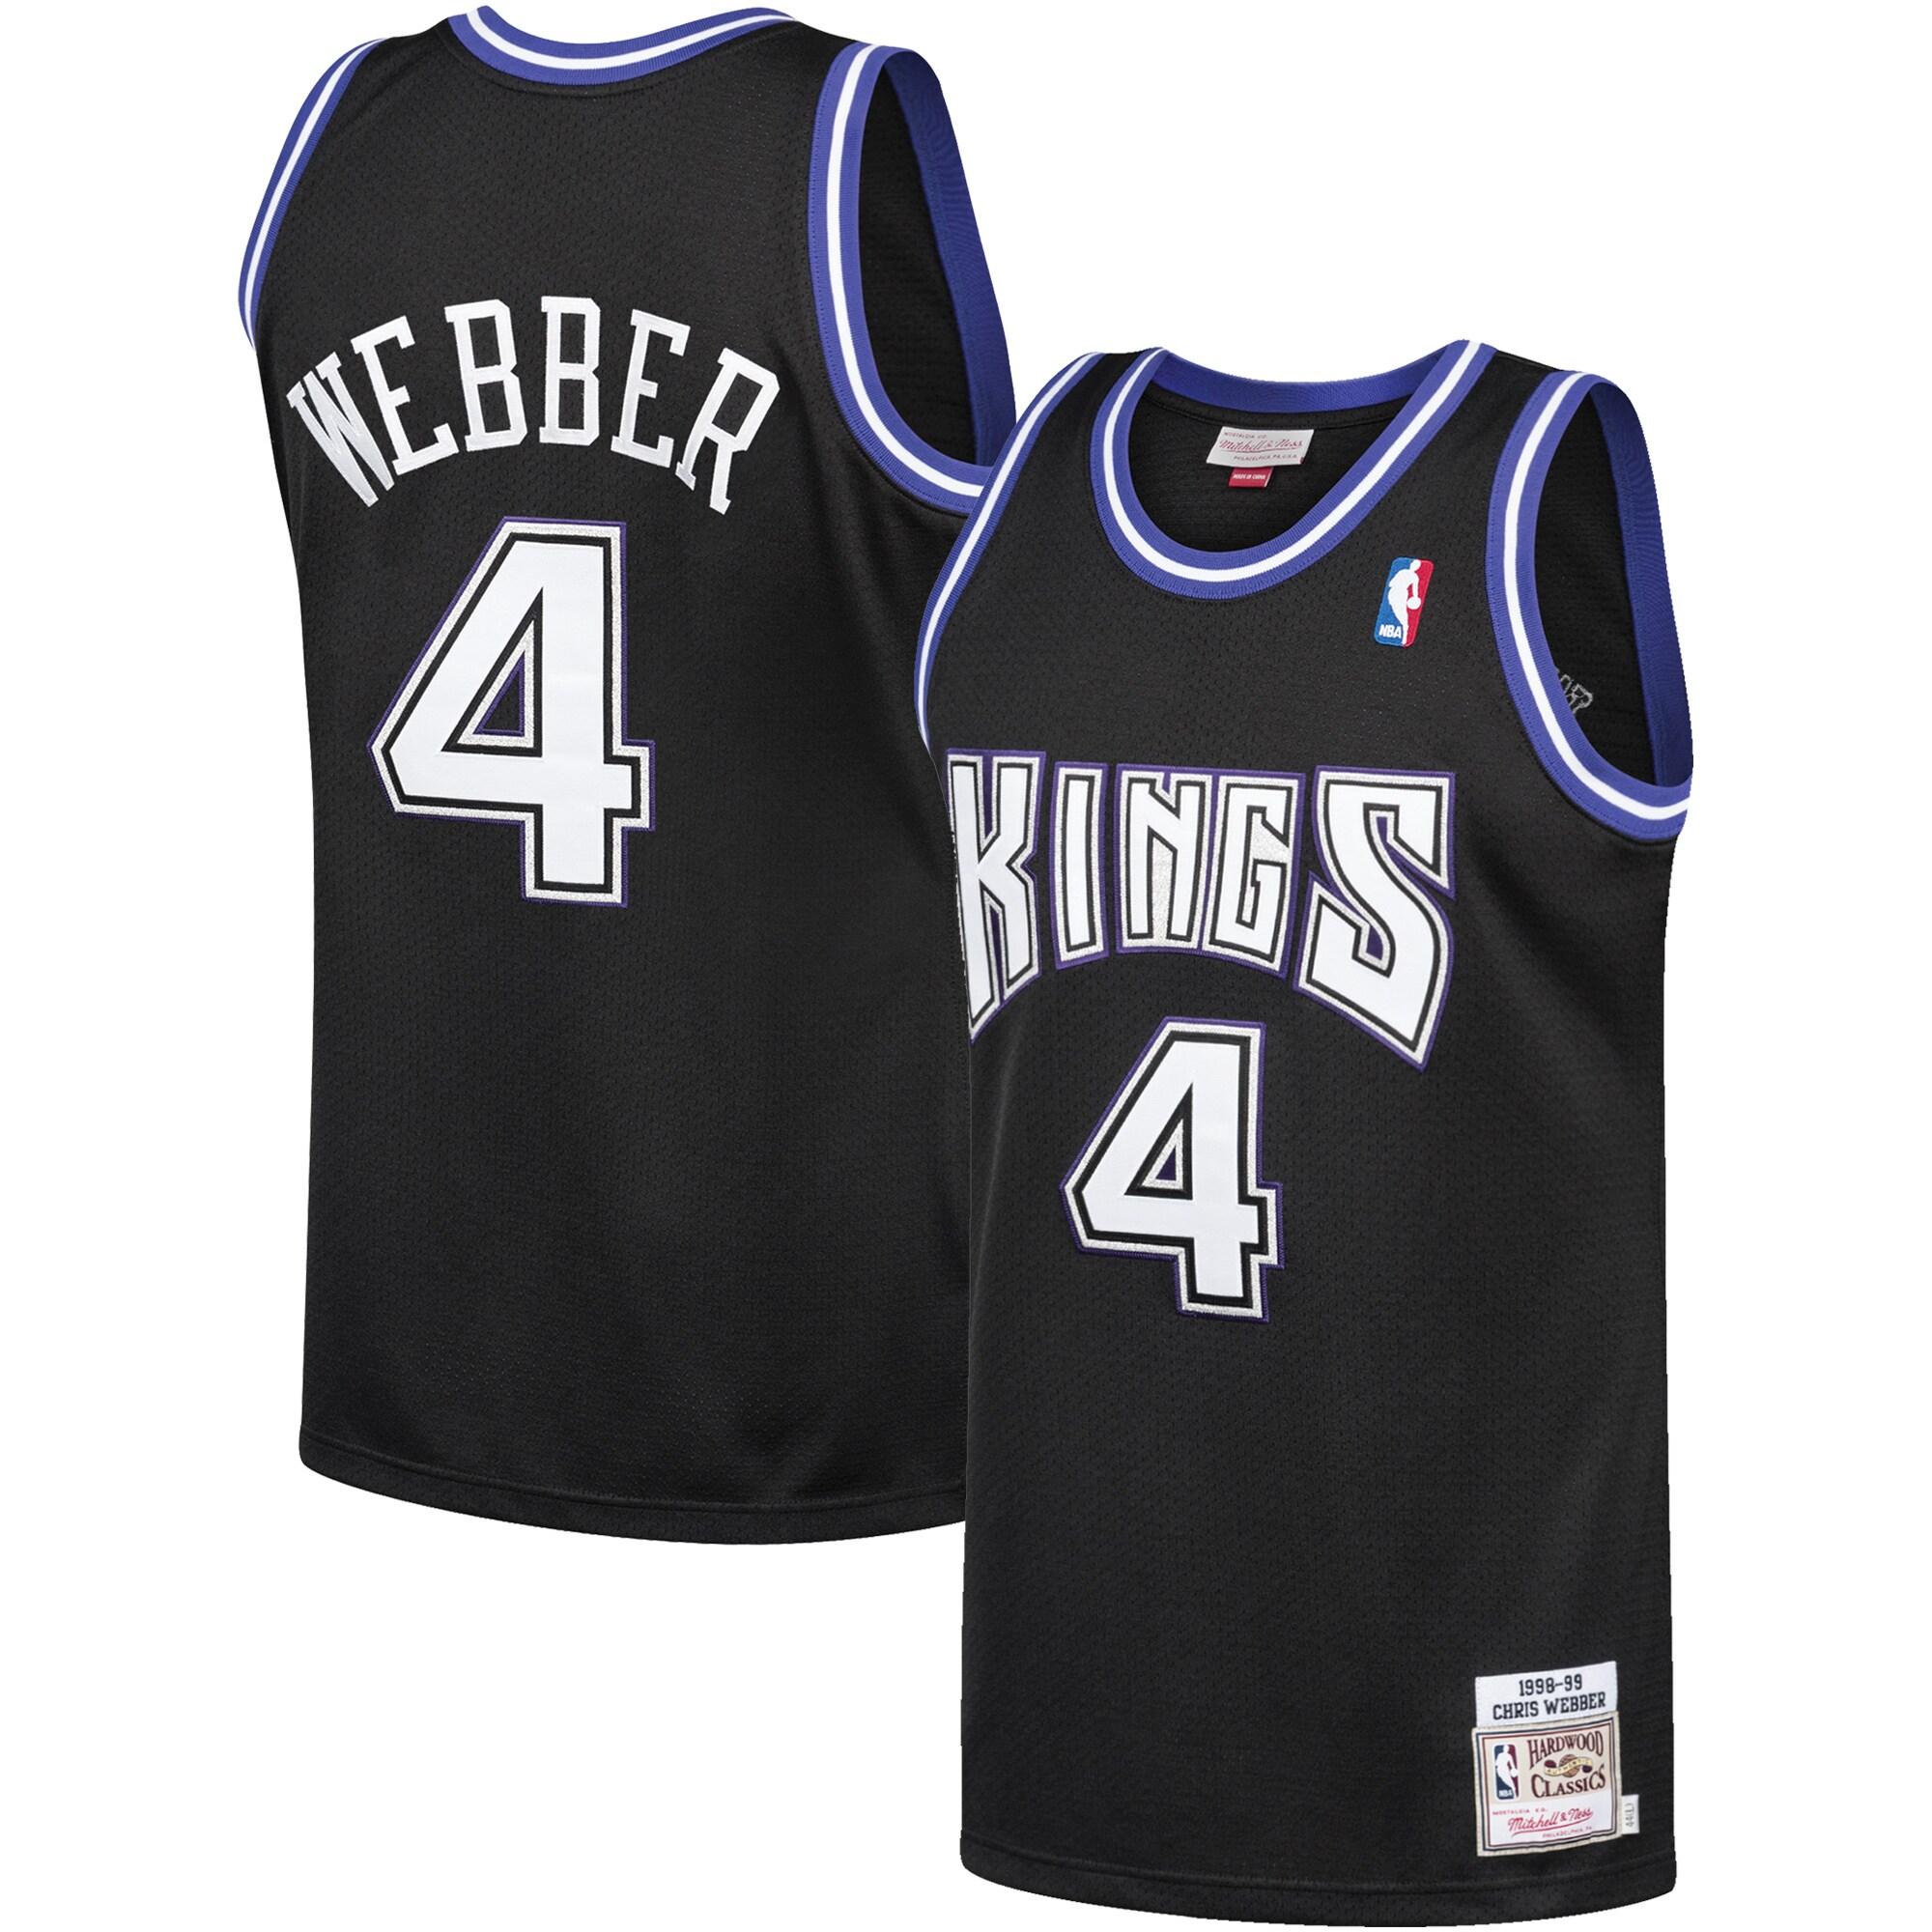 Chris Webber Sacramento Kings Mitchell & Ness 1998-99 Hardwood Classics Authentic Jersey - Black